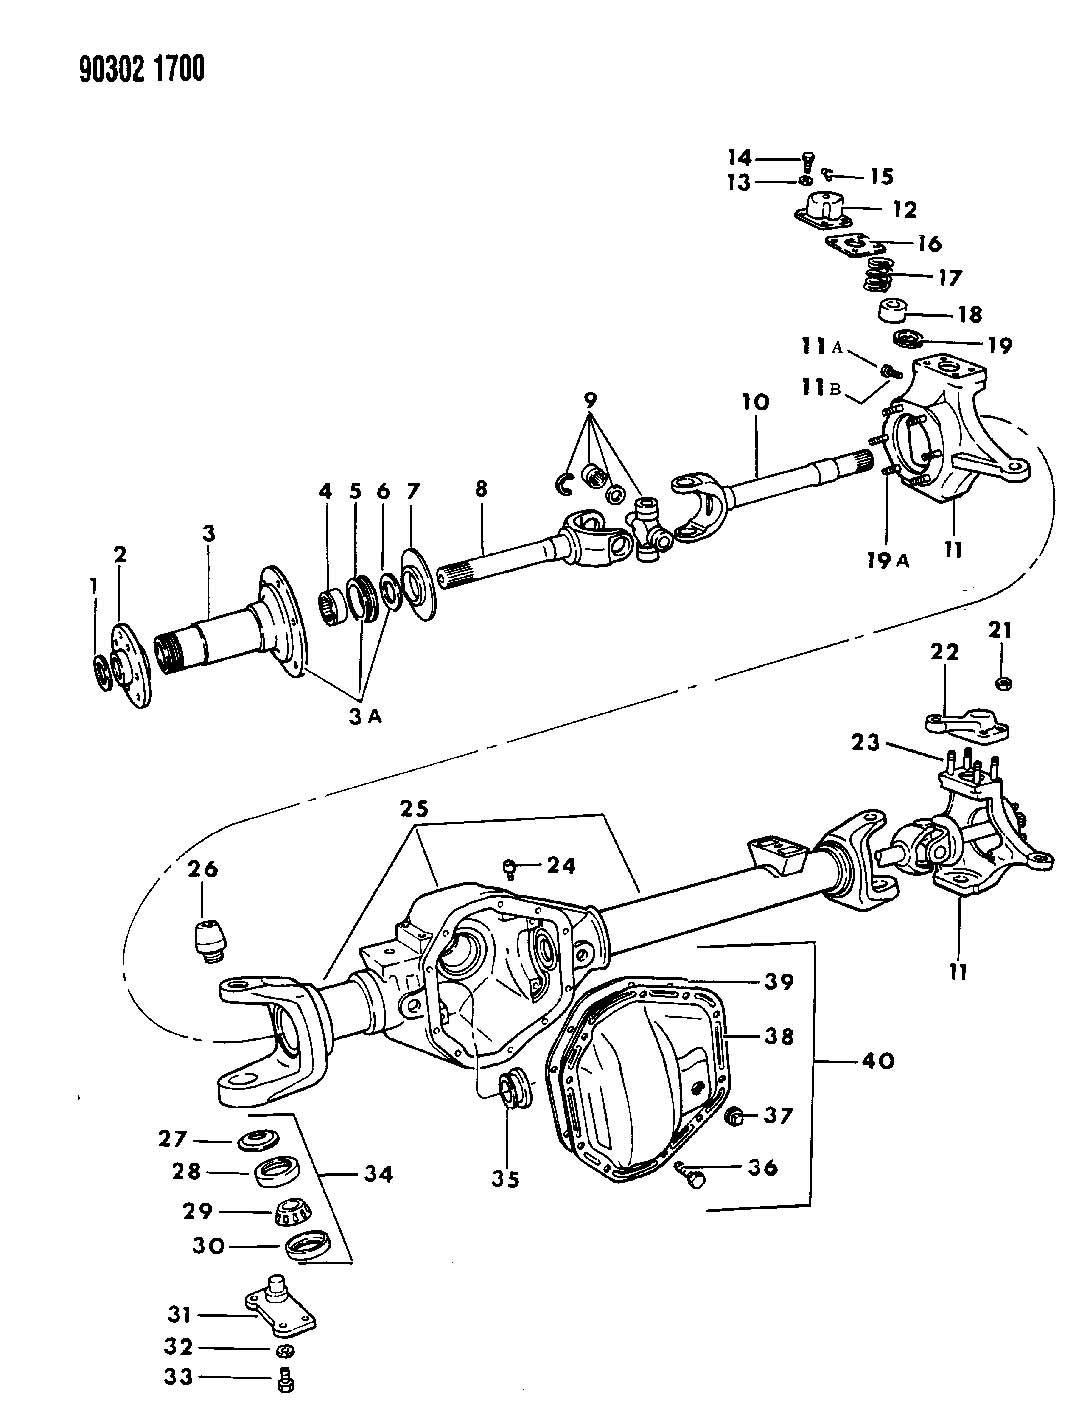 Dana 60 King Pin Diagram Wiring And Engine Diagram